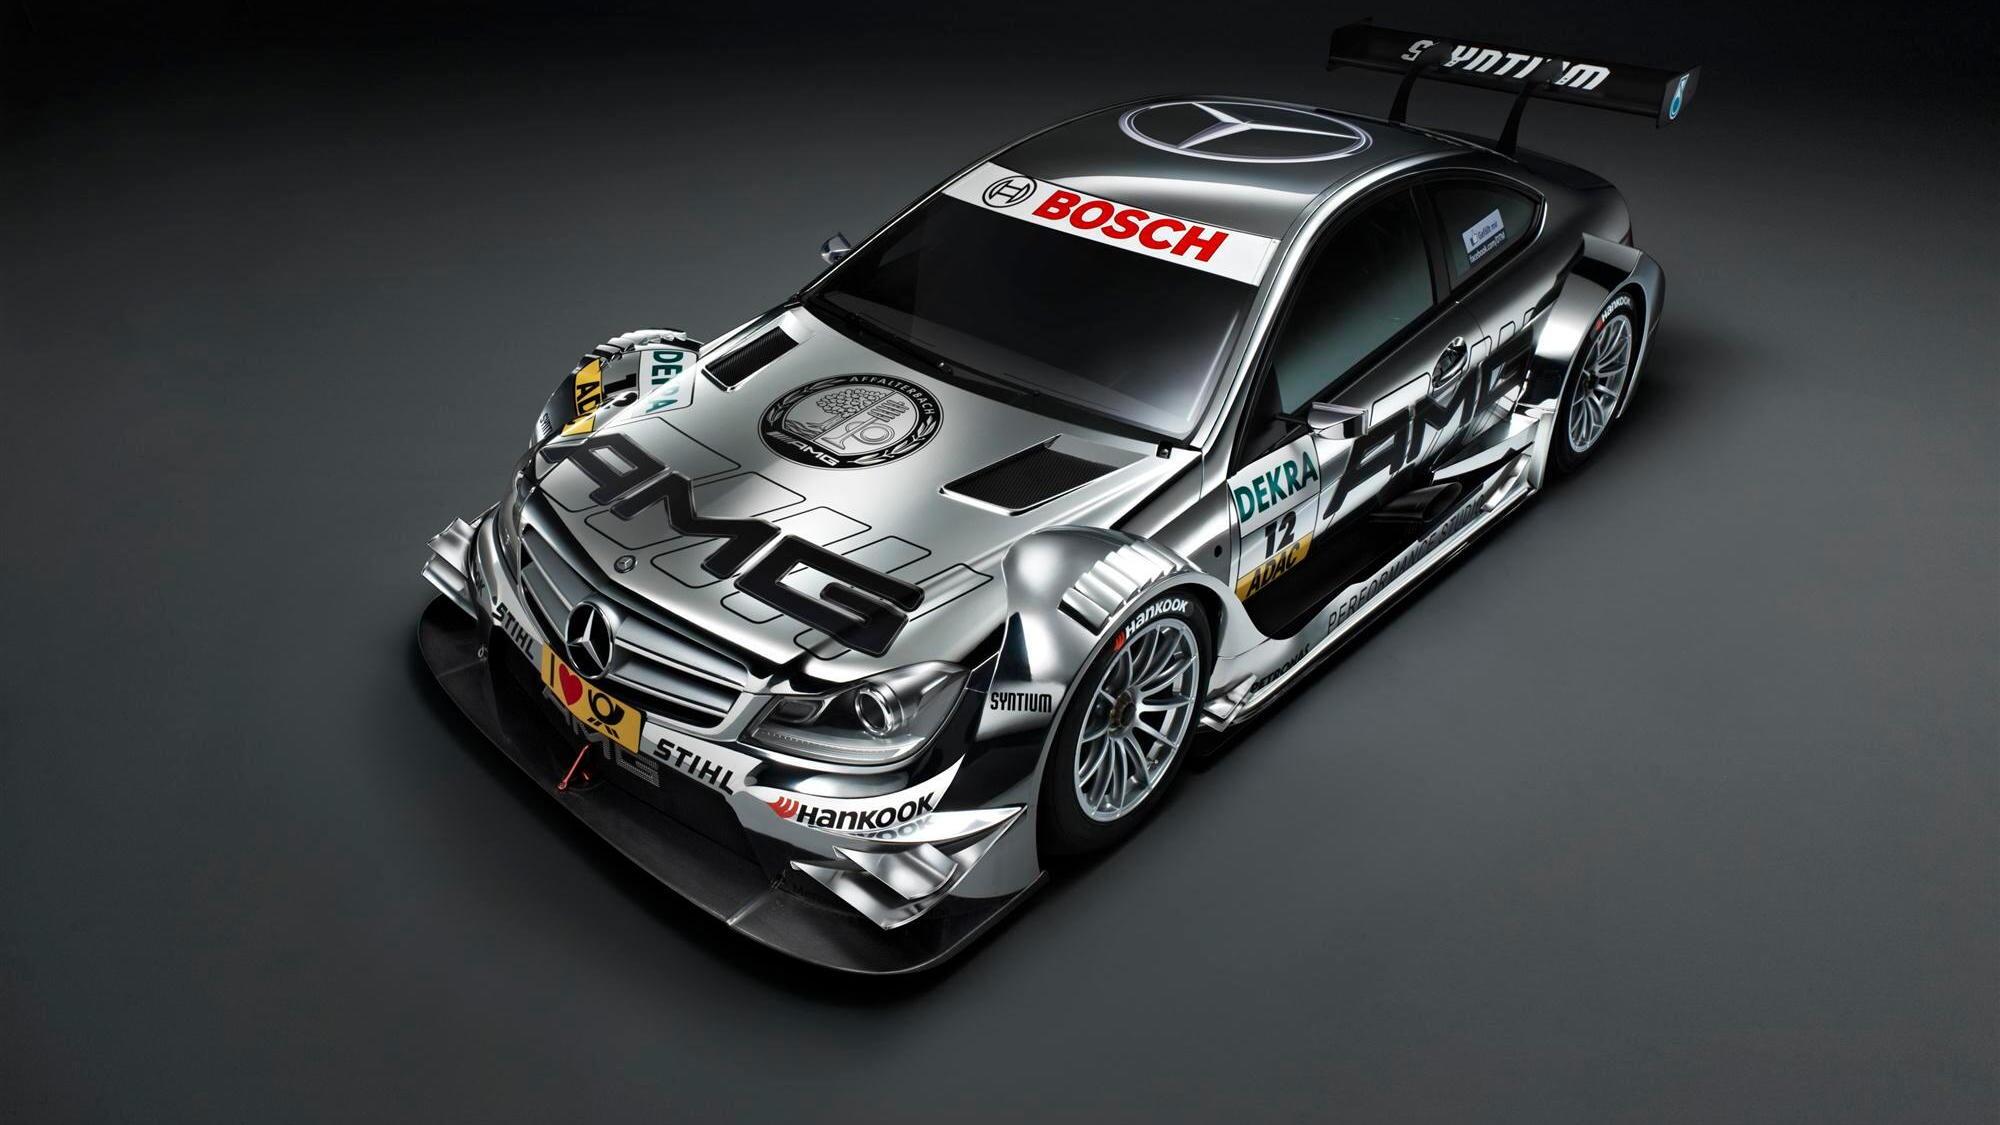 2012 Mercedes DTM AMG C-Coupe